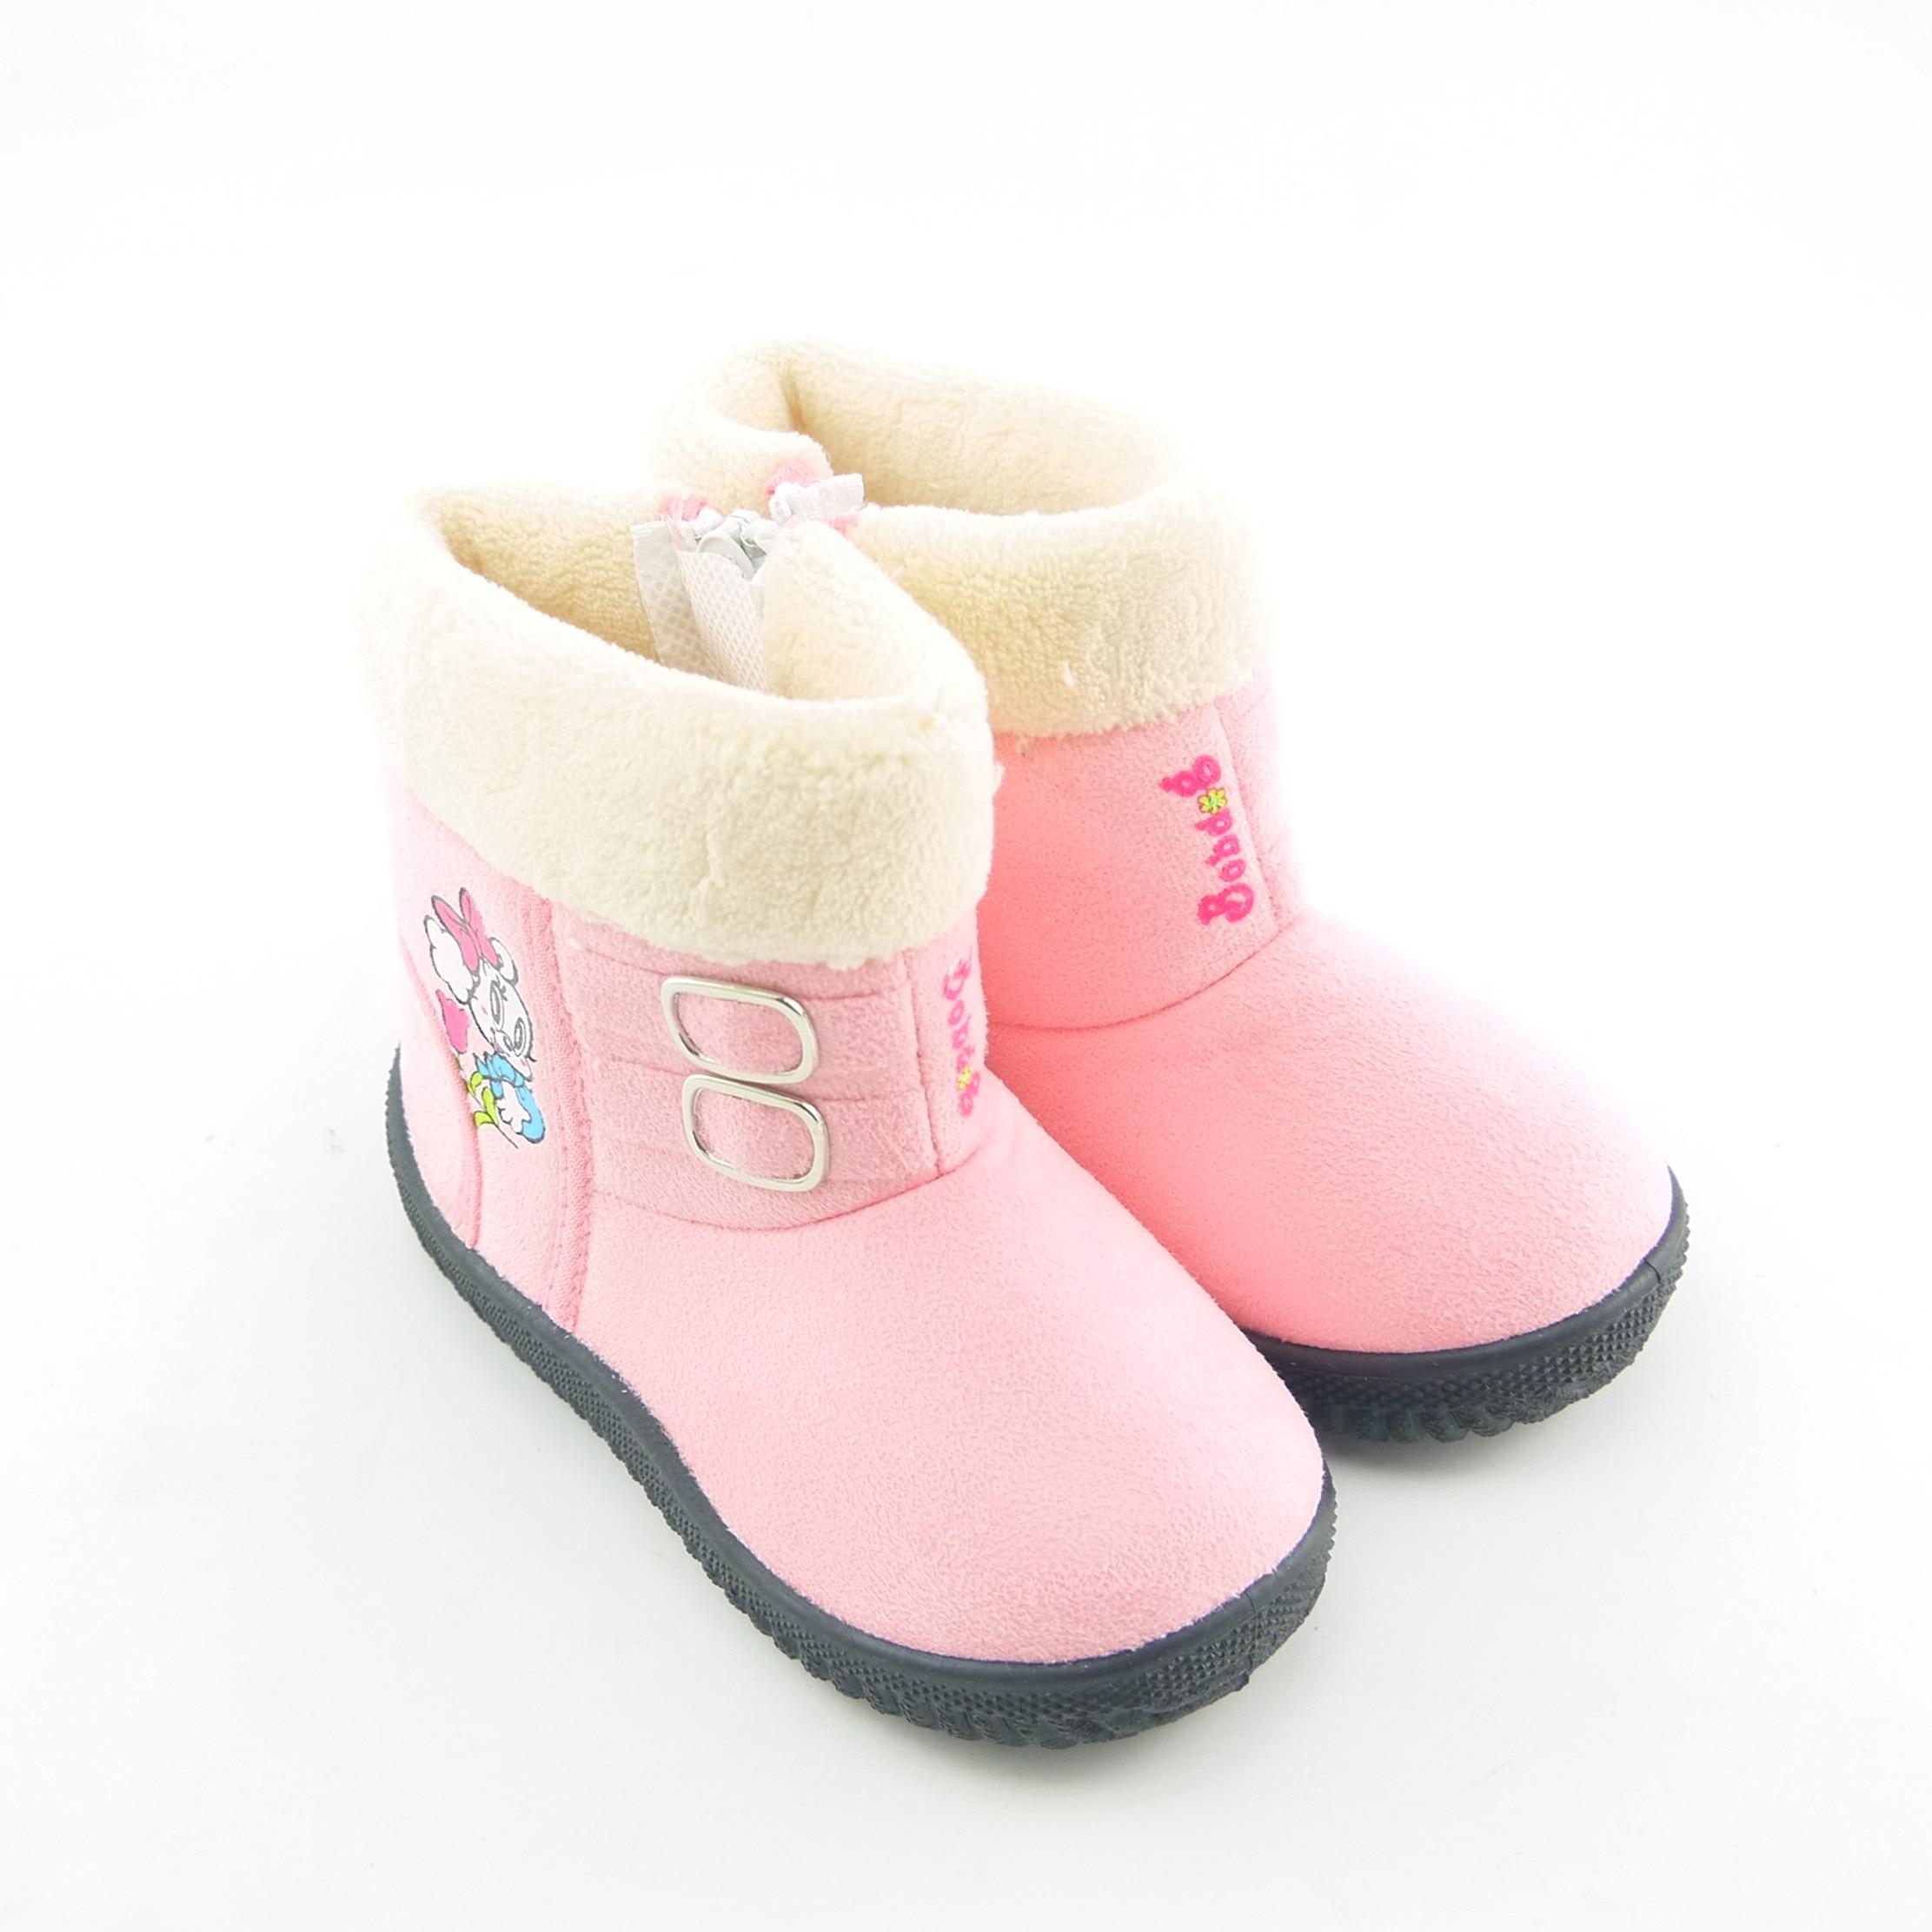 Koovan Baby Shoes 2020 Winter Warm Children Boots Dog Cartoon Cotton Girls Snow Boot Boys Girls Kids Rubber Shoes 23-27